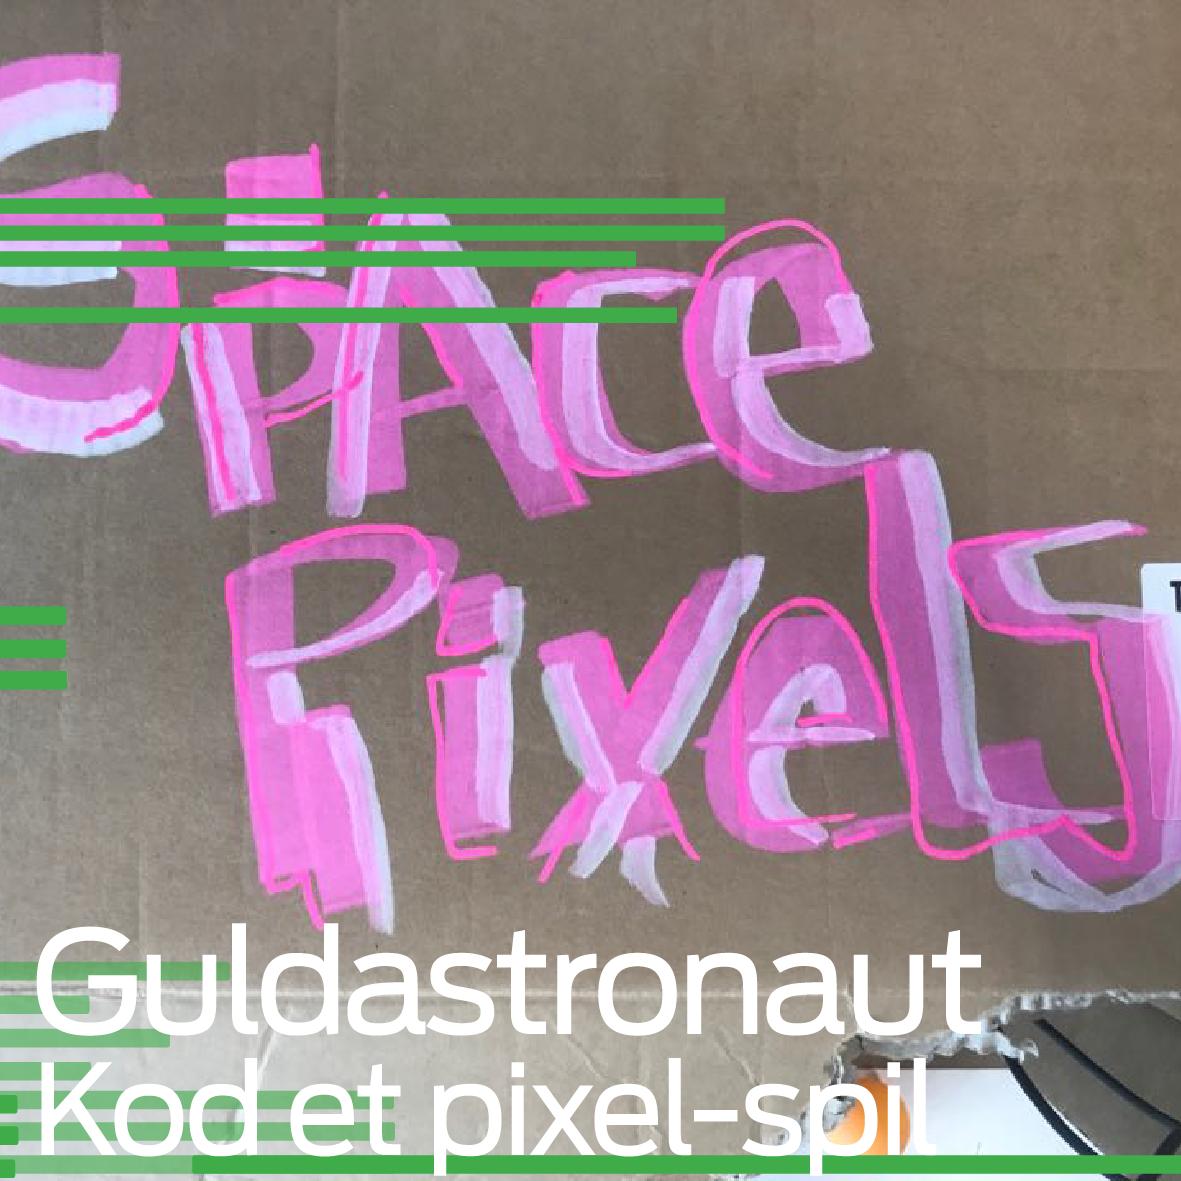 Guldastronaut: Kod et pixel-spil